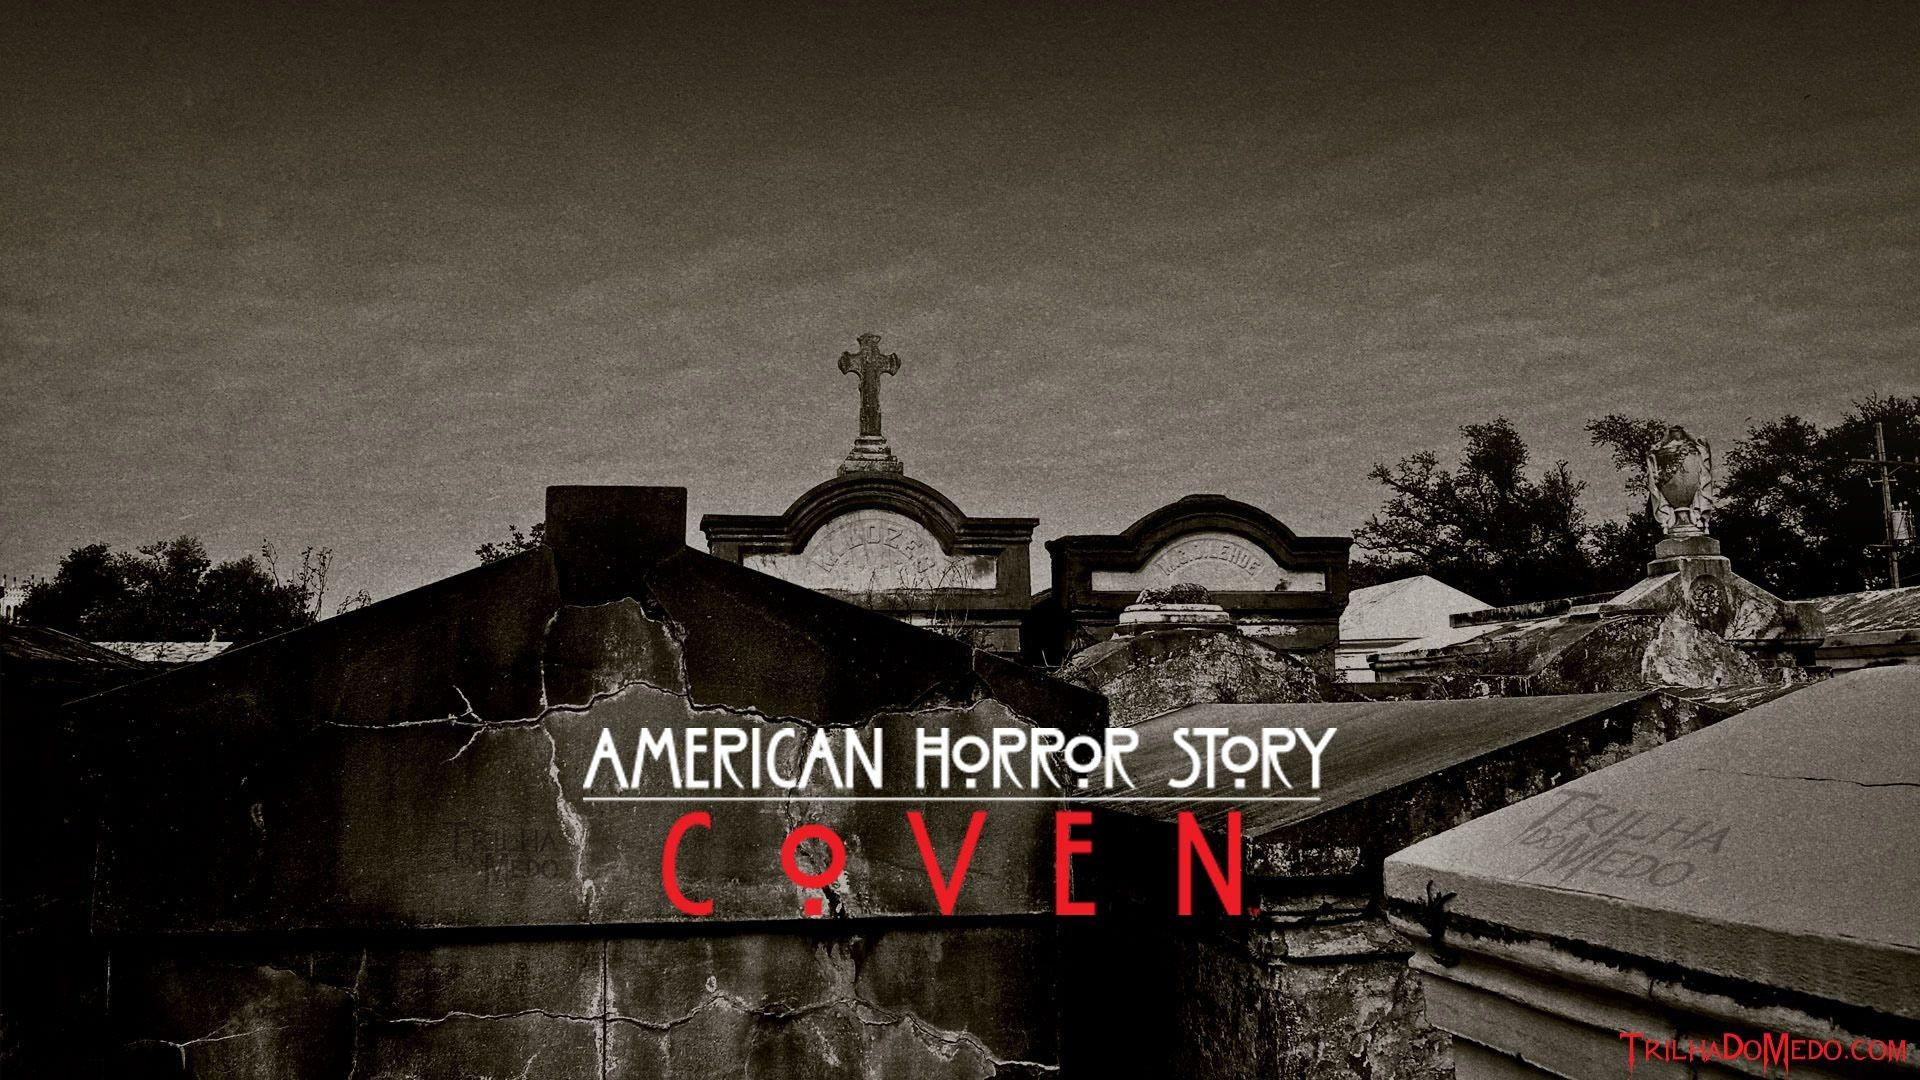 American Horror Story Coven Wallpaper – Full Screen Wallpaper HD